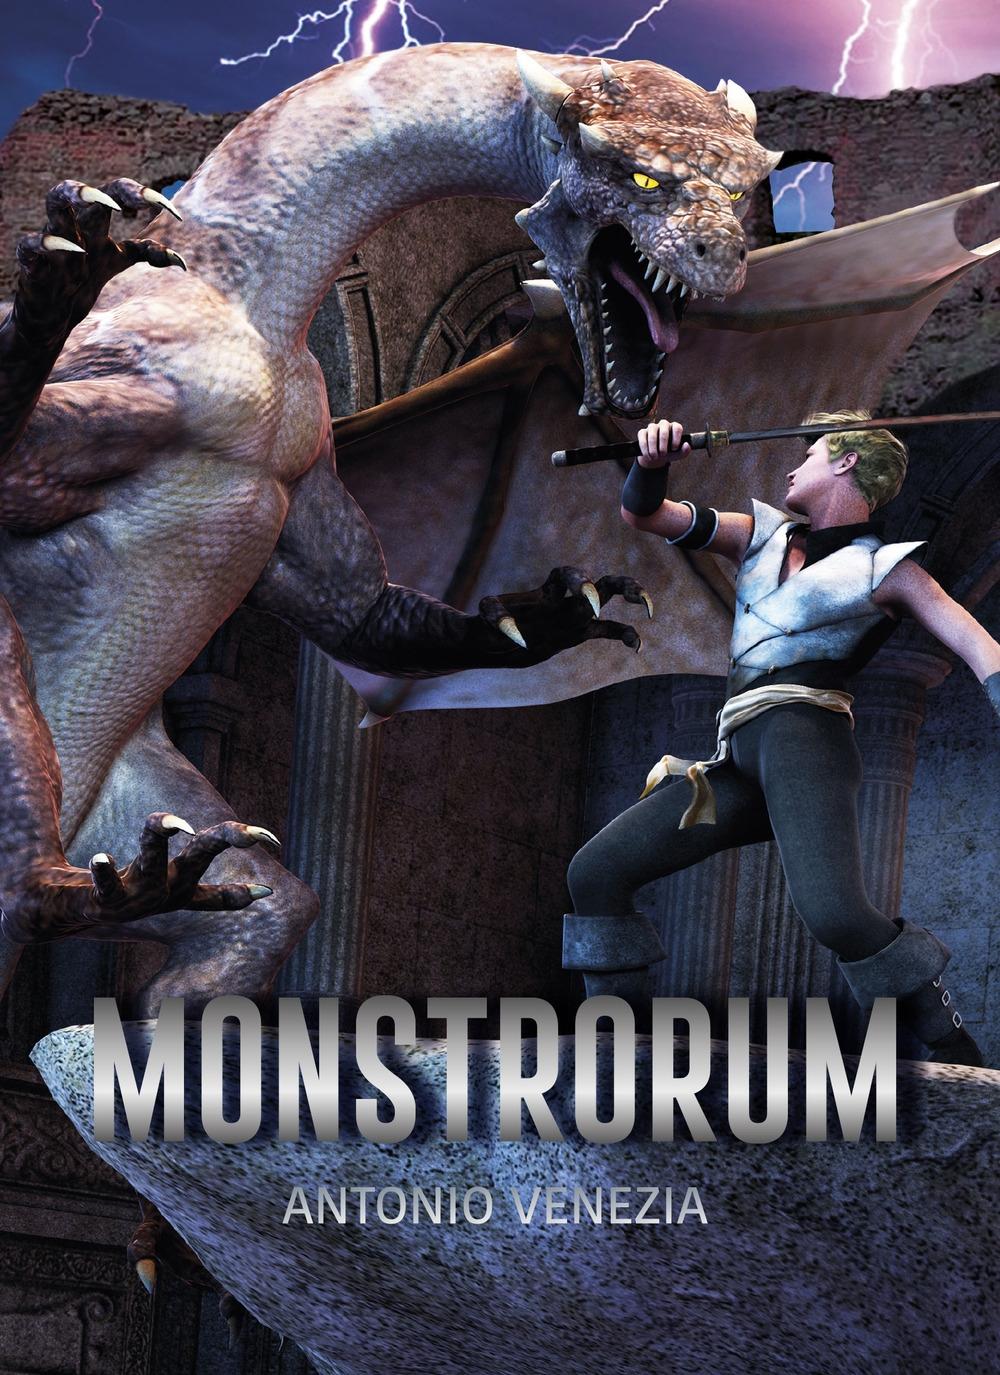 Monstrorum